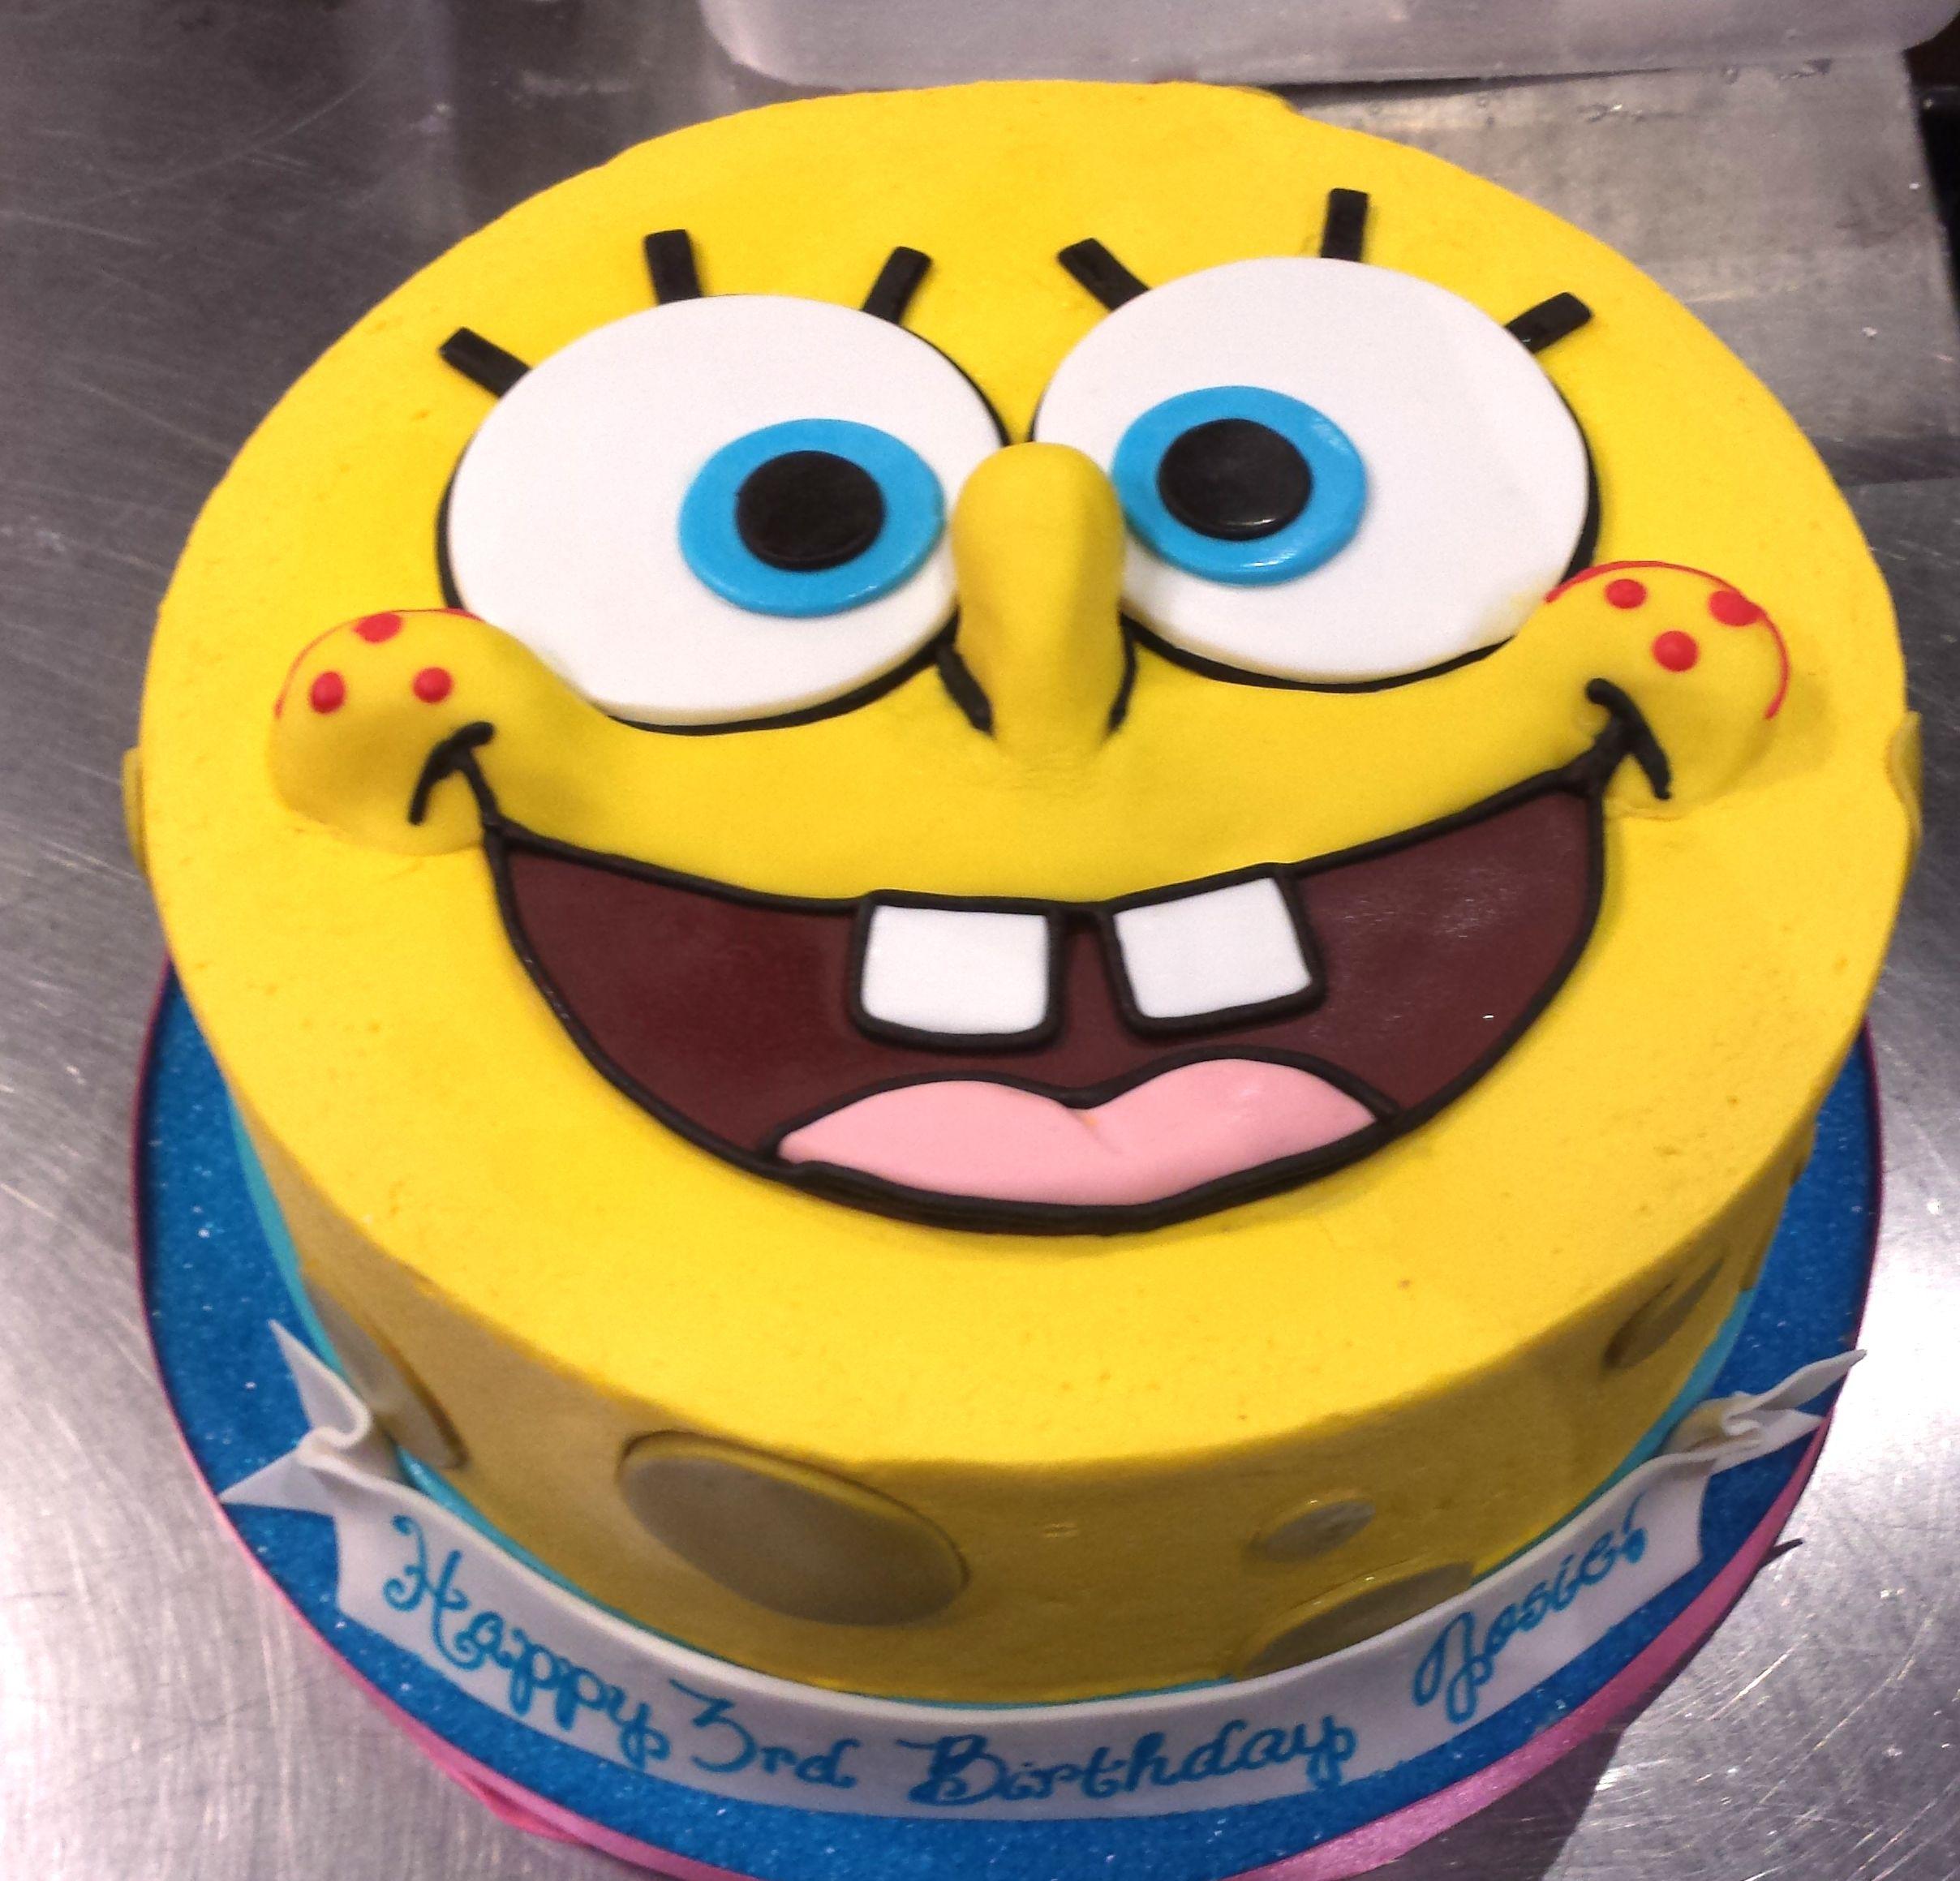 Astonishing Spongebob Cake With Images Spongebob Birthday Cake Spongebob Funny Birthday Cards Online Alyptdamsfinfo